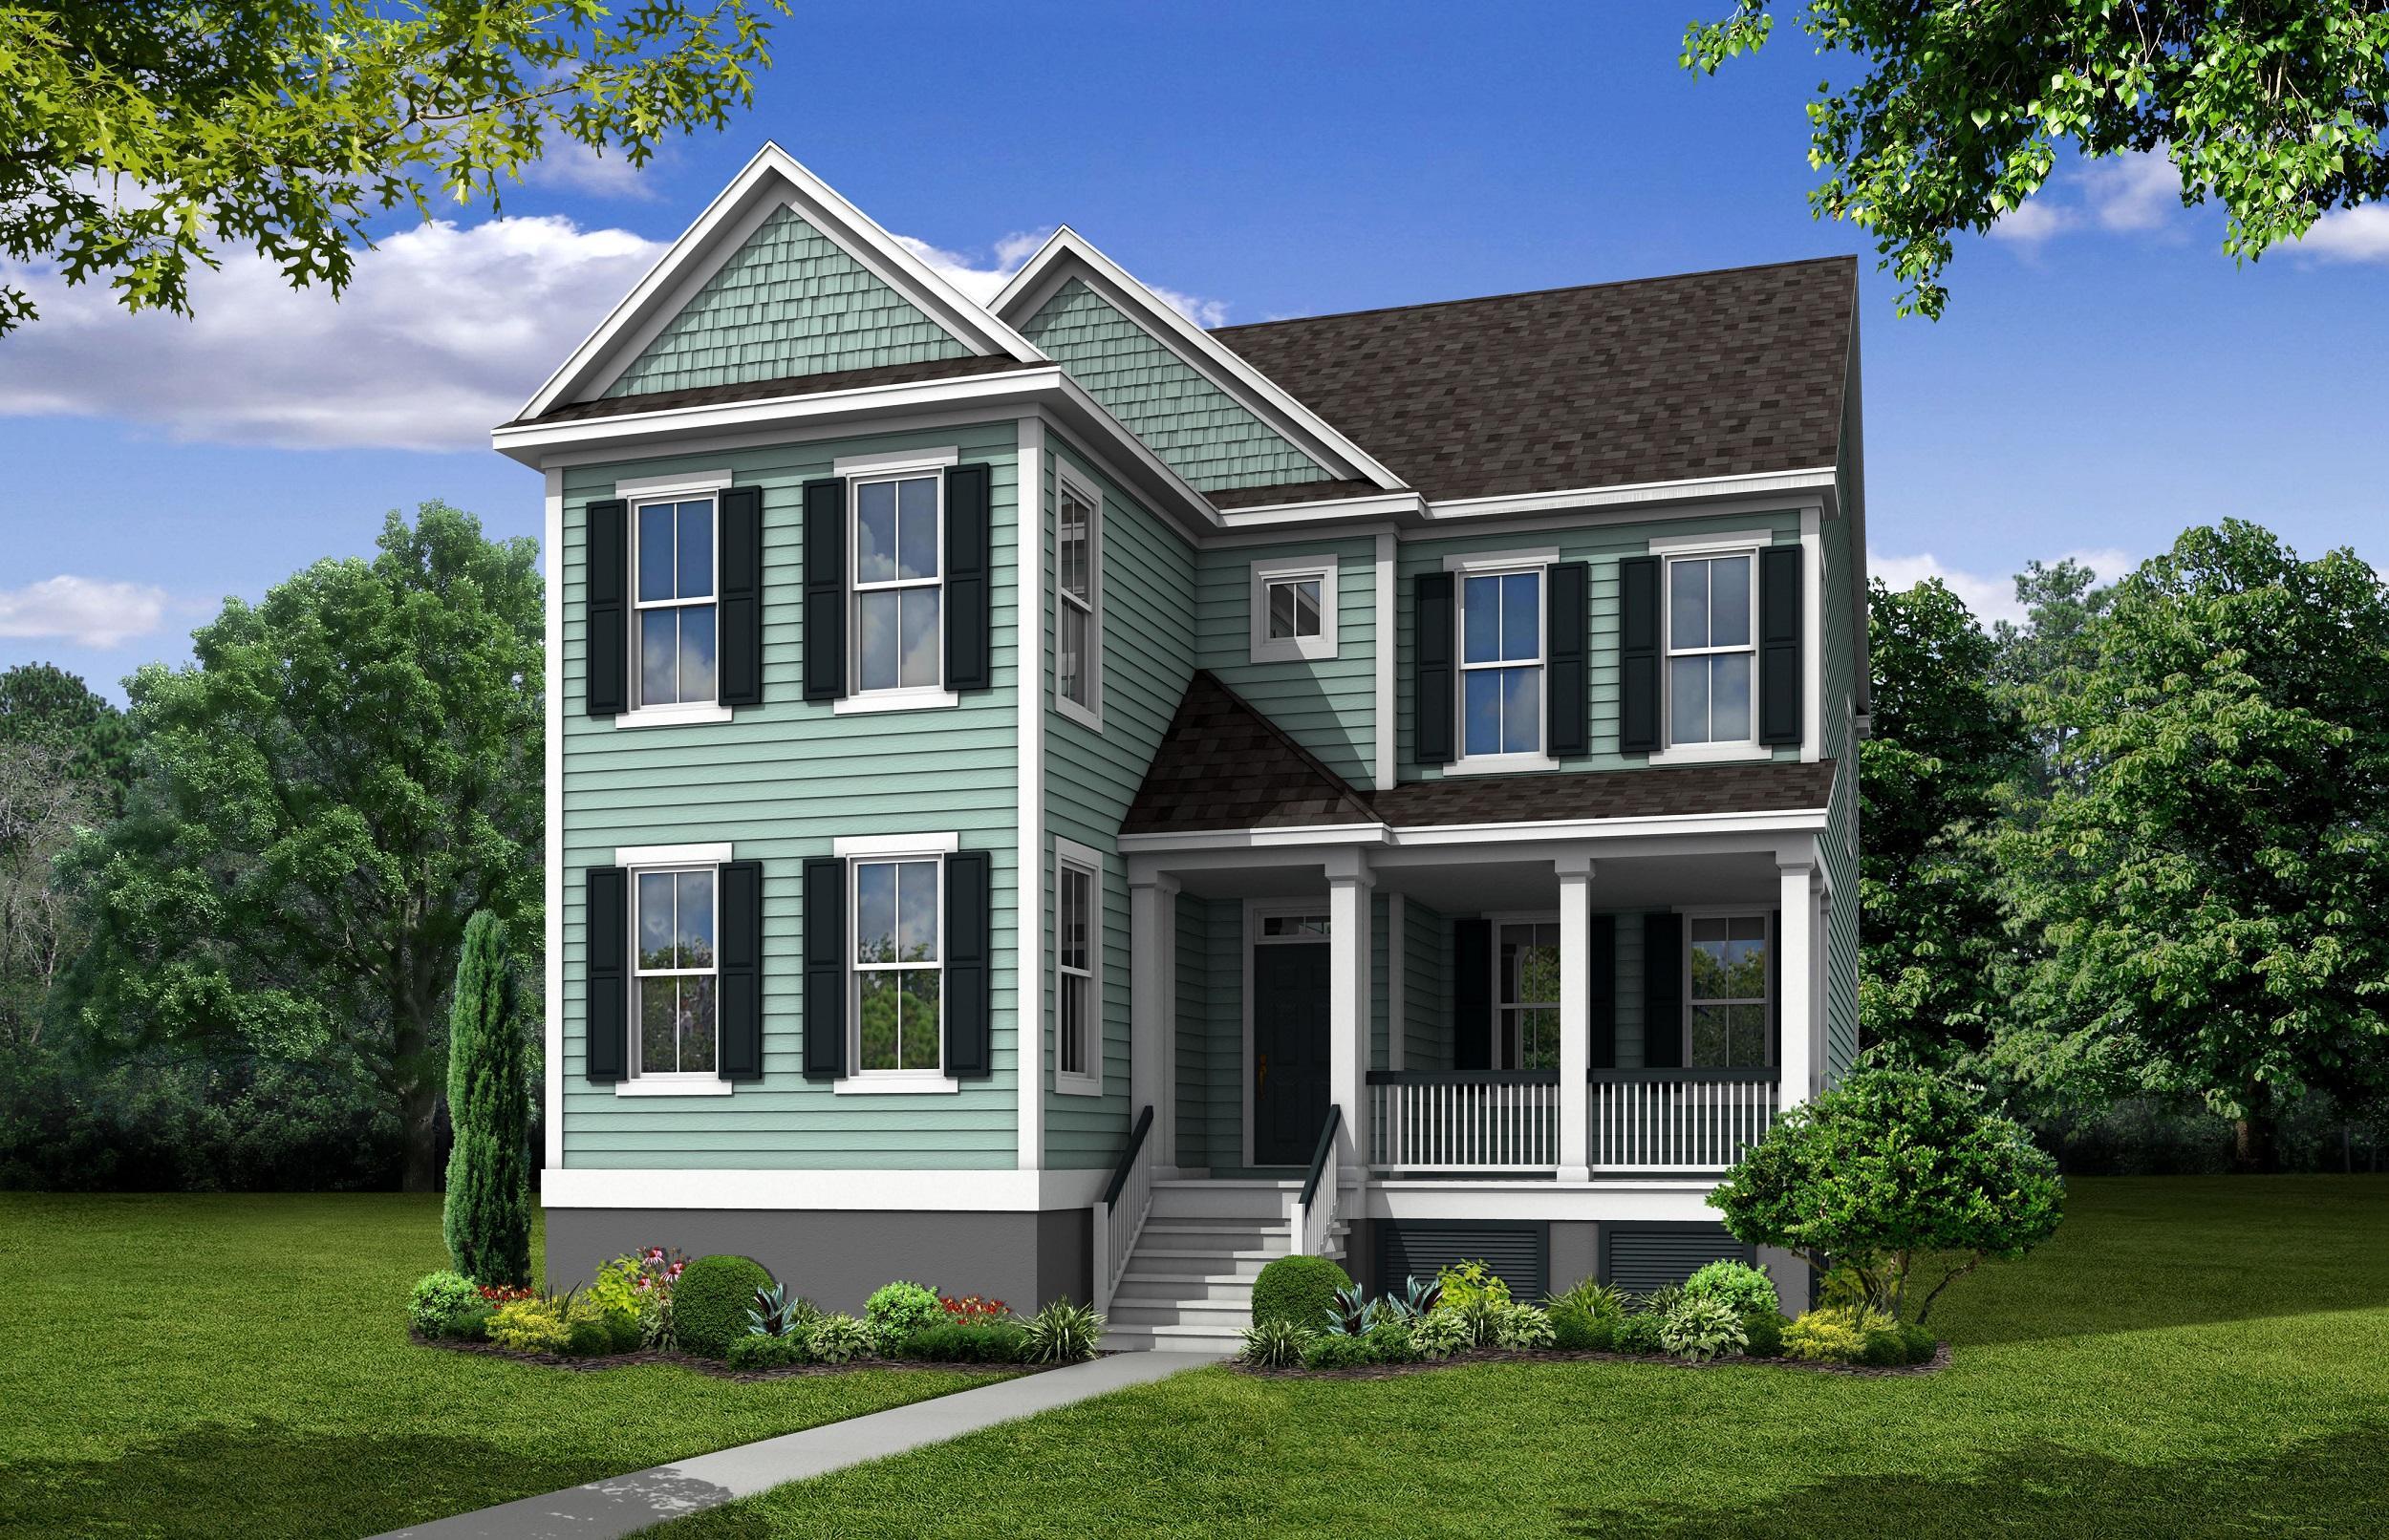 709 N Hickory Street Summerville, SC 29483